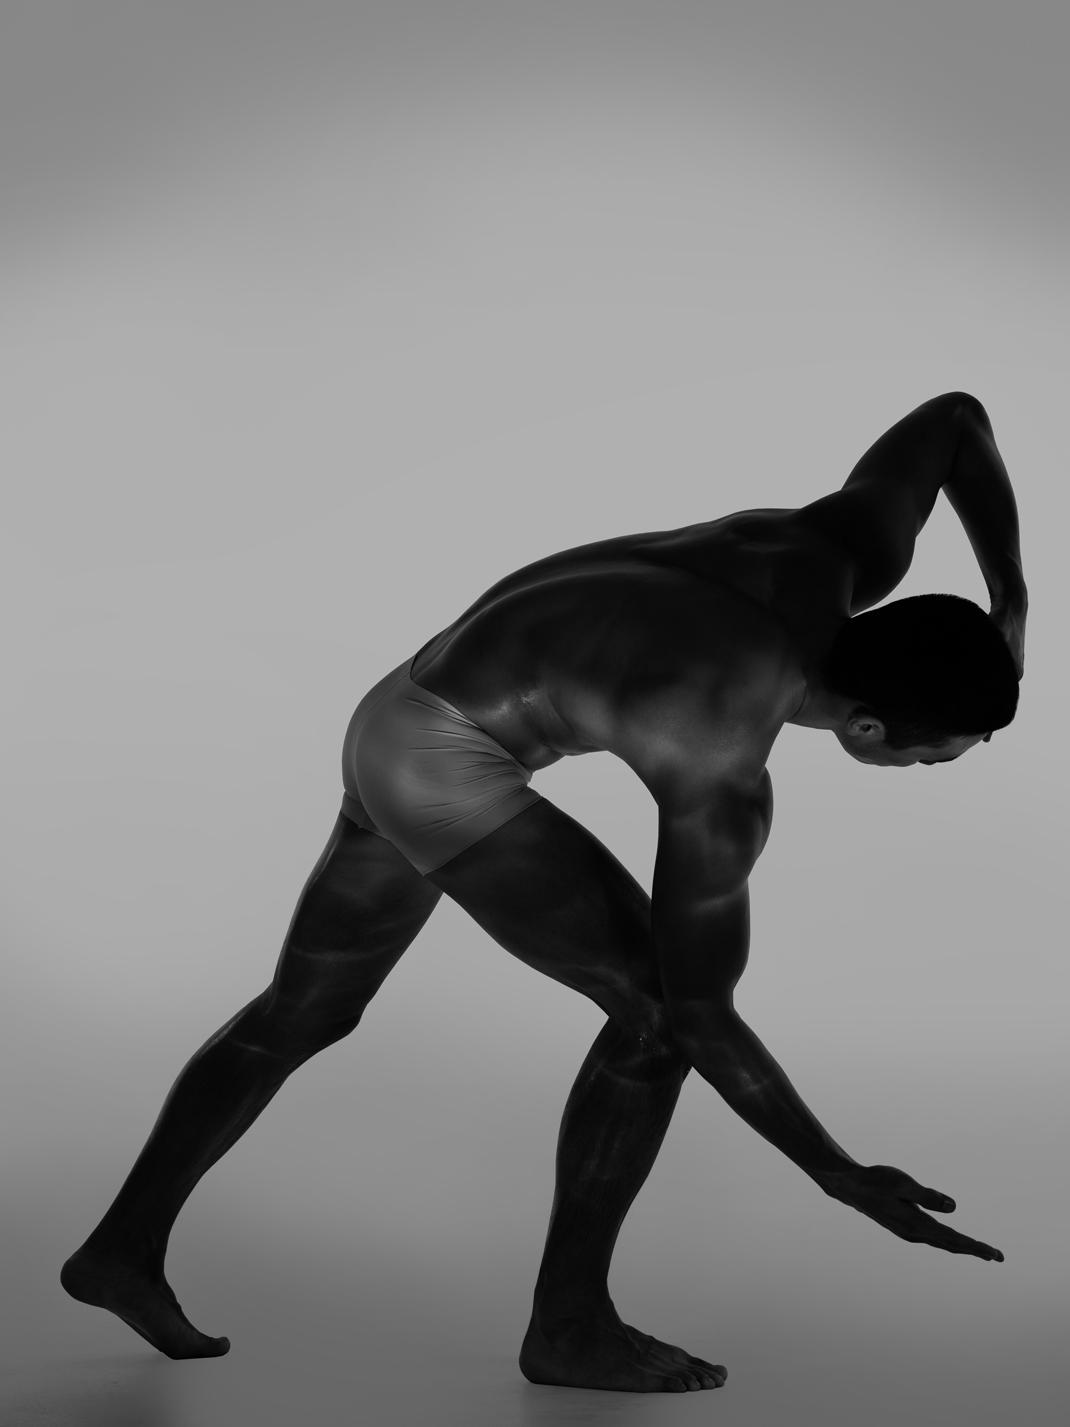 Ближе к телу: специальная съемка Louis Vuitton x BURO. (фото 11)